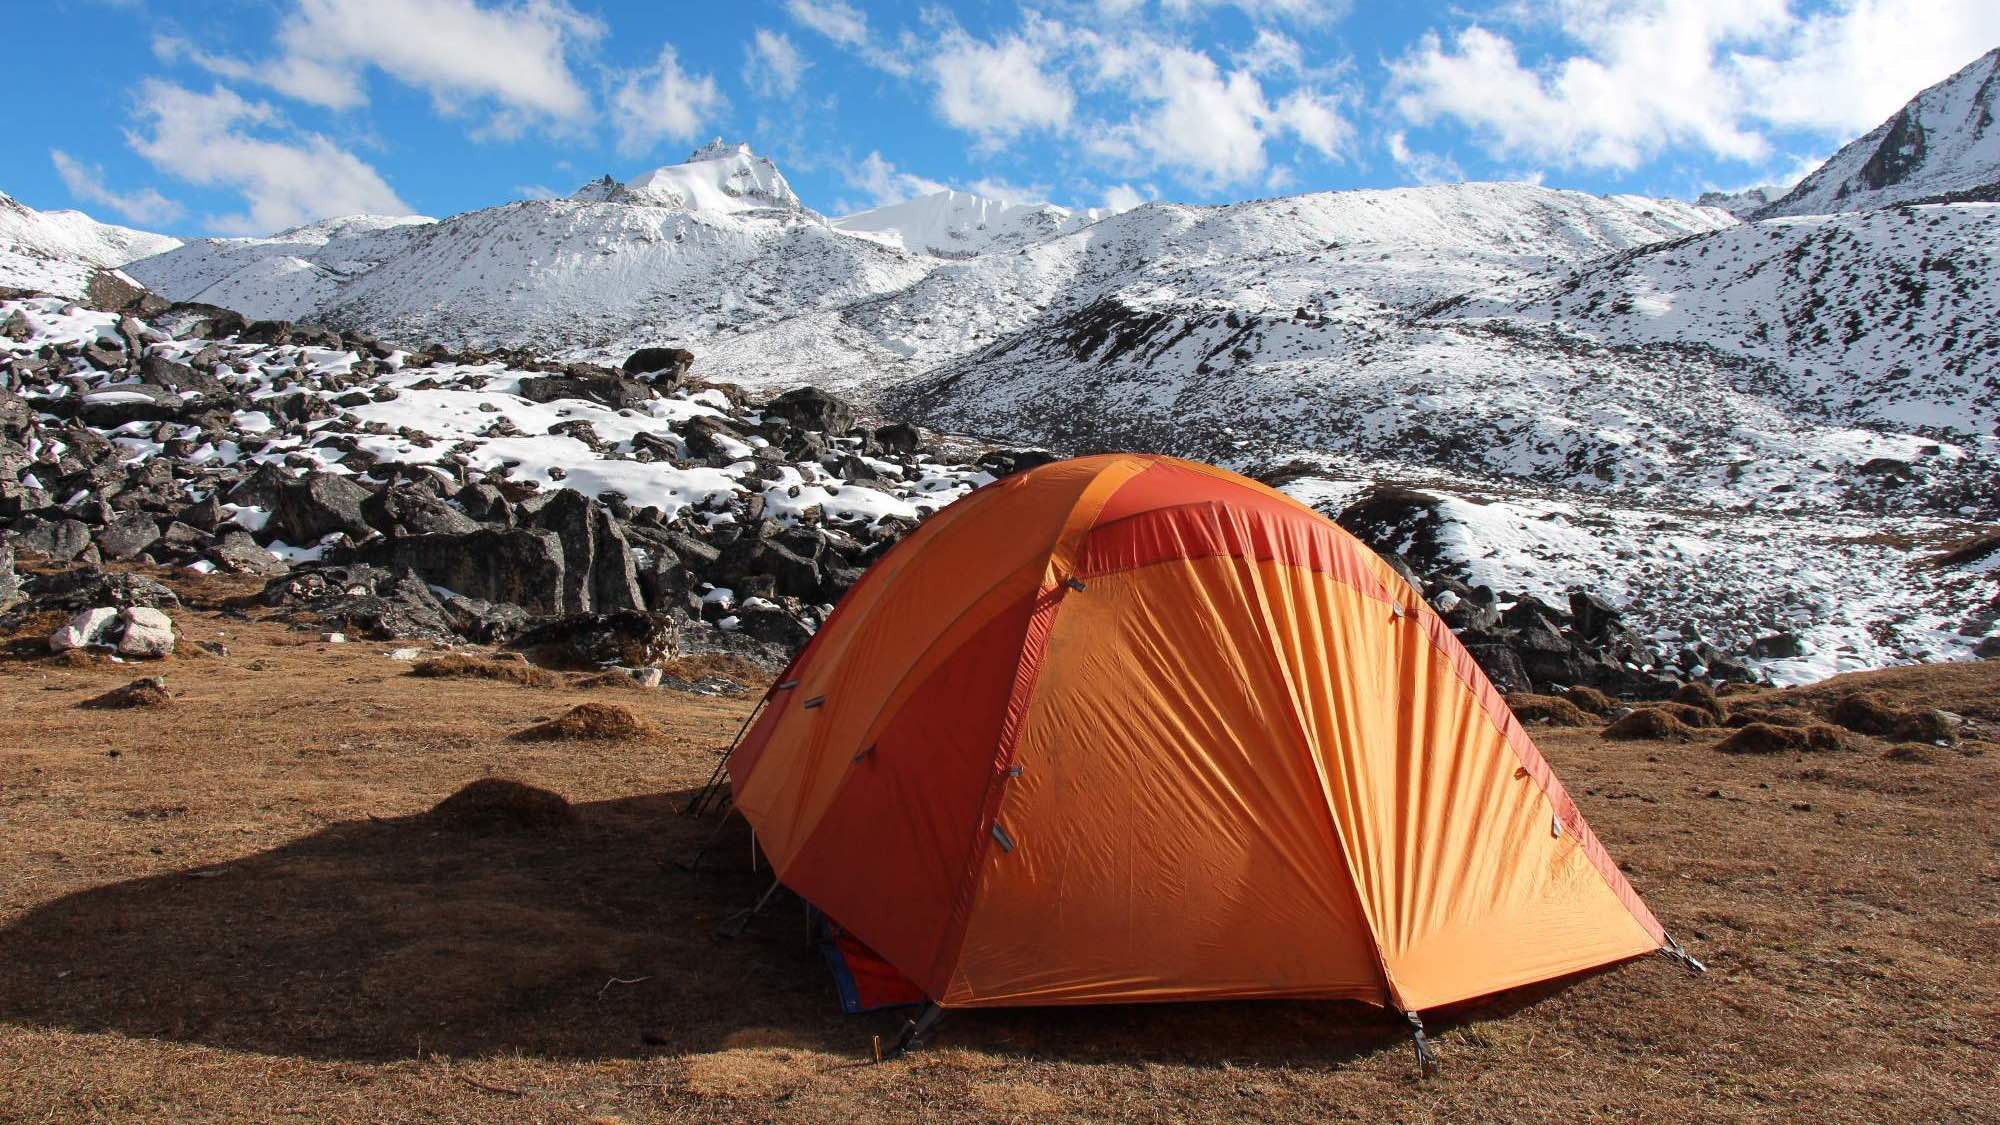 Camp site set below one of the passes of the Snowman trek in Bhutan - Photo: Veronika Švecová